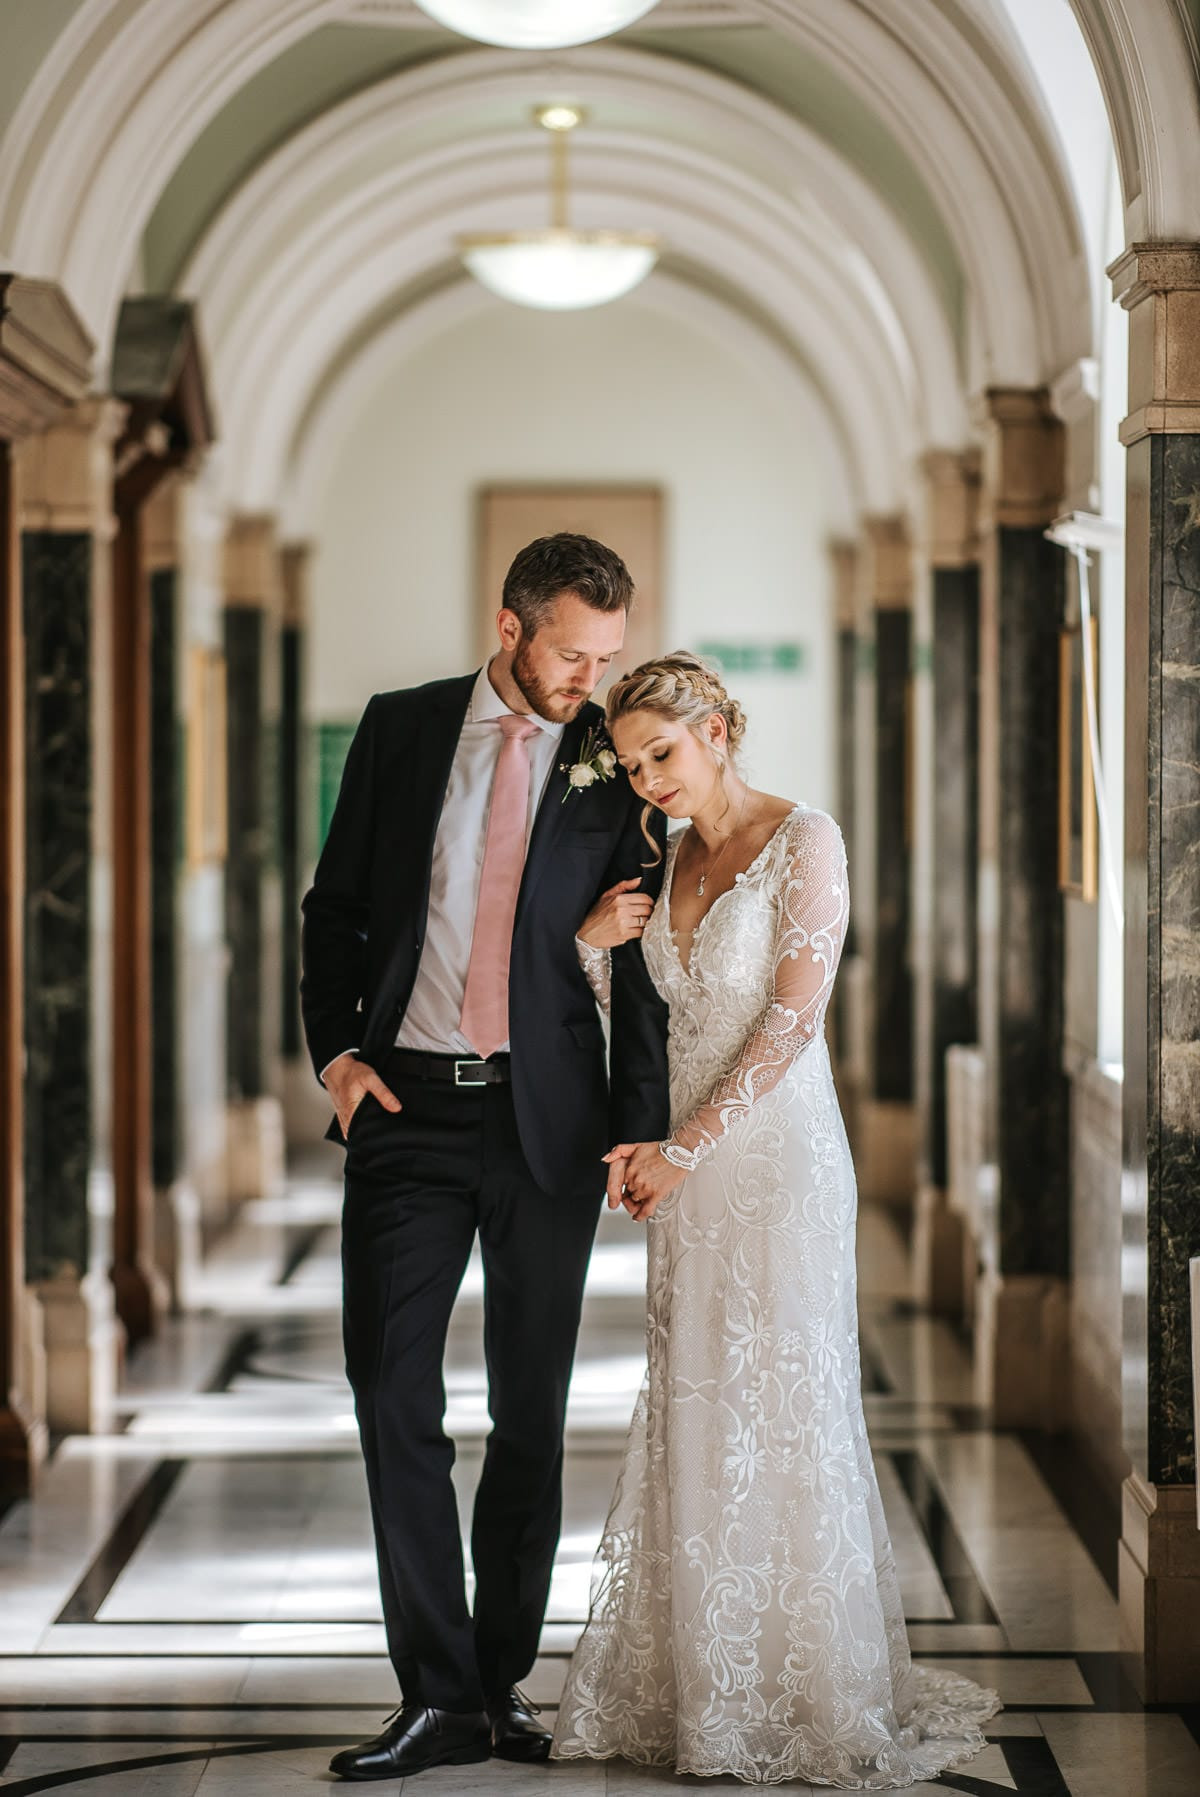 islington town hall wedding couple photo shoot inside